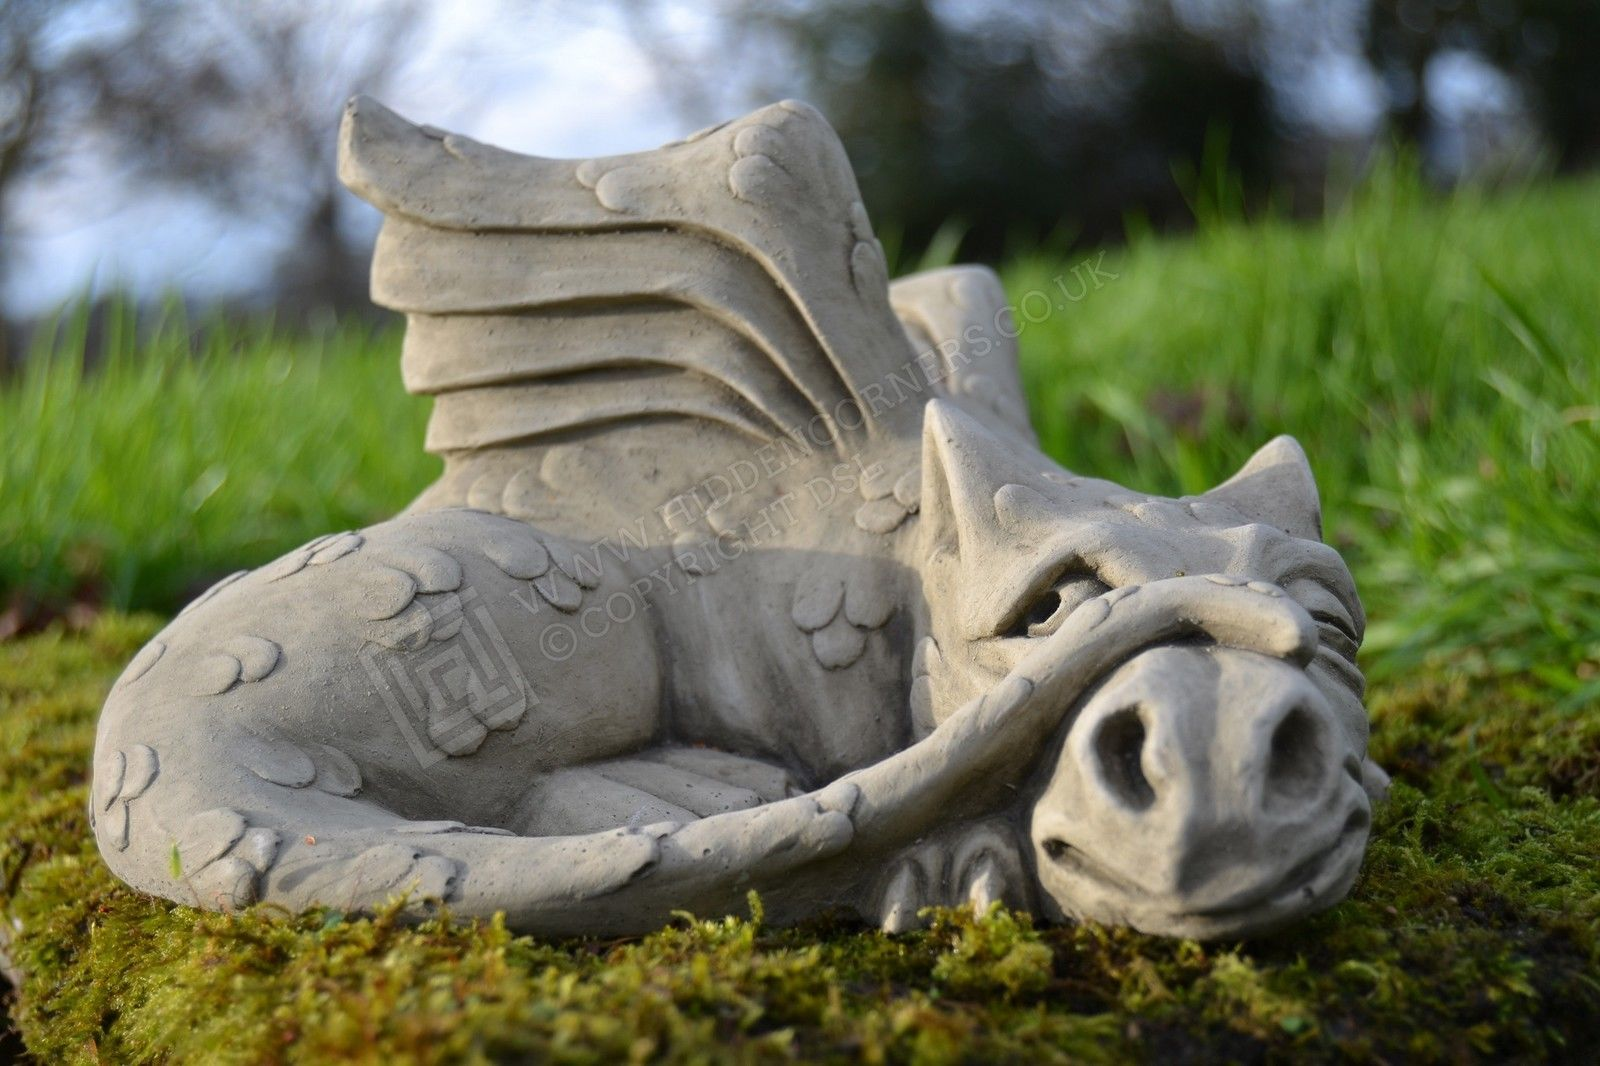 James-dragon #garden ornament-gargoyle-sculpture #stone #statue ...